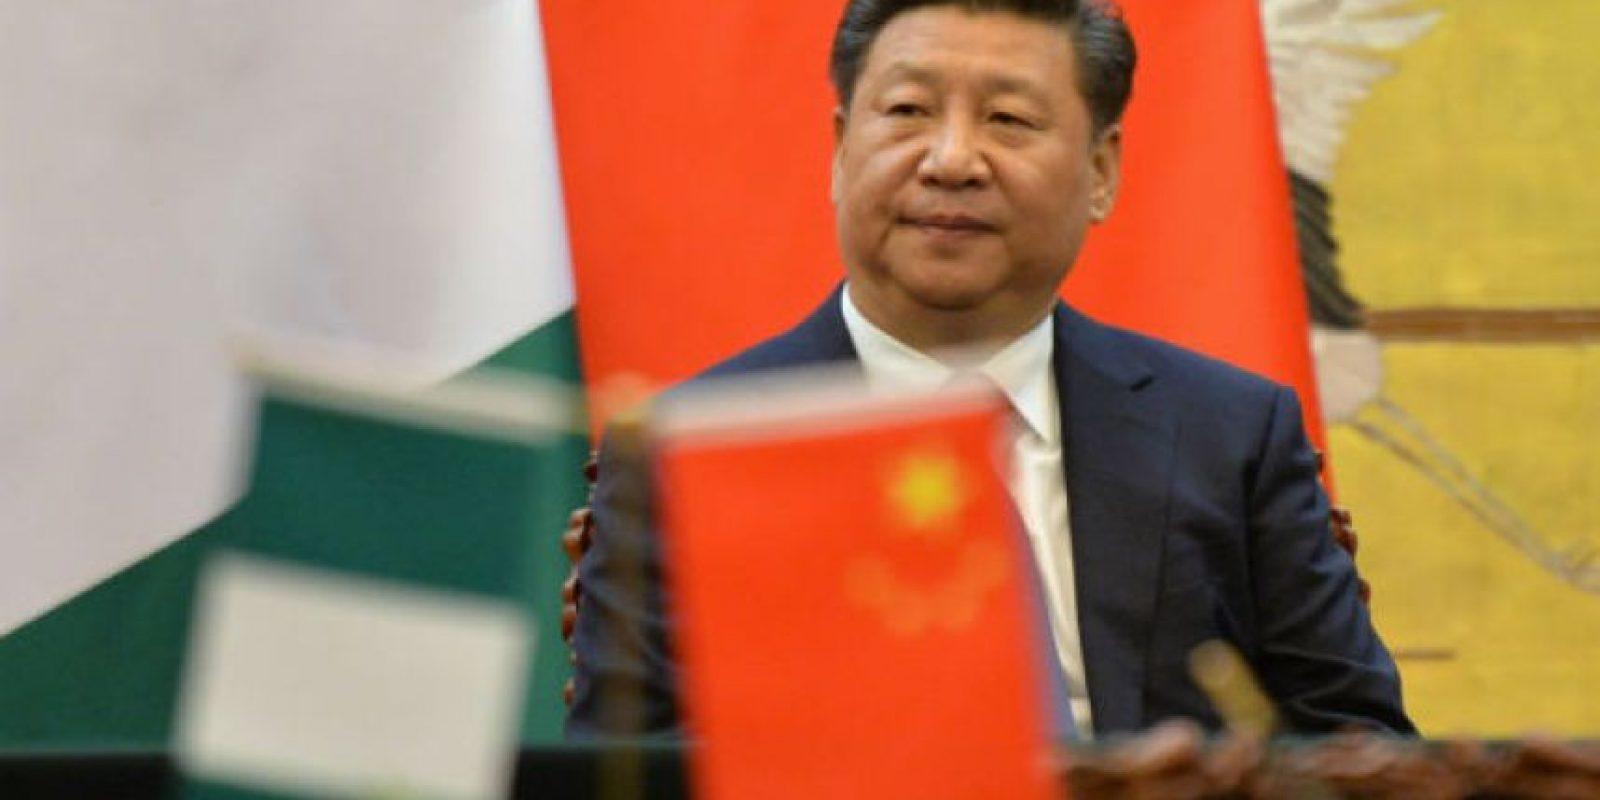 Xi Jinping. Presidente de la República Popular China. Foto:Getty Images